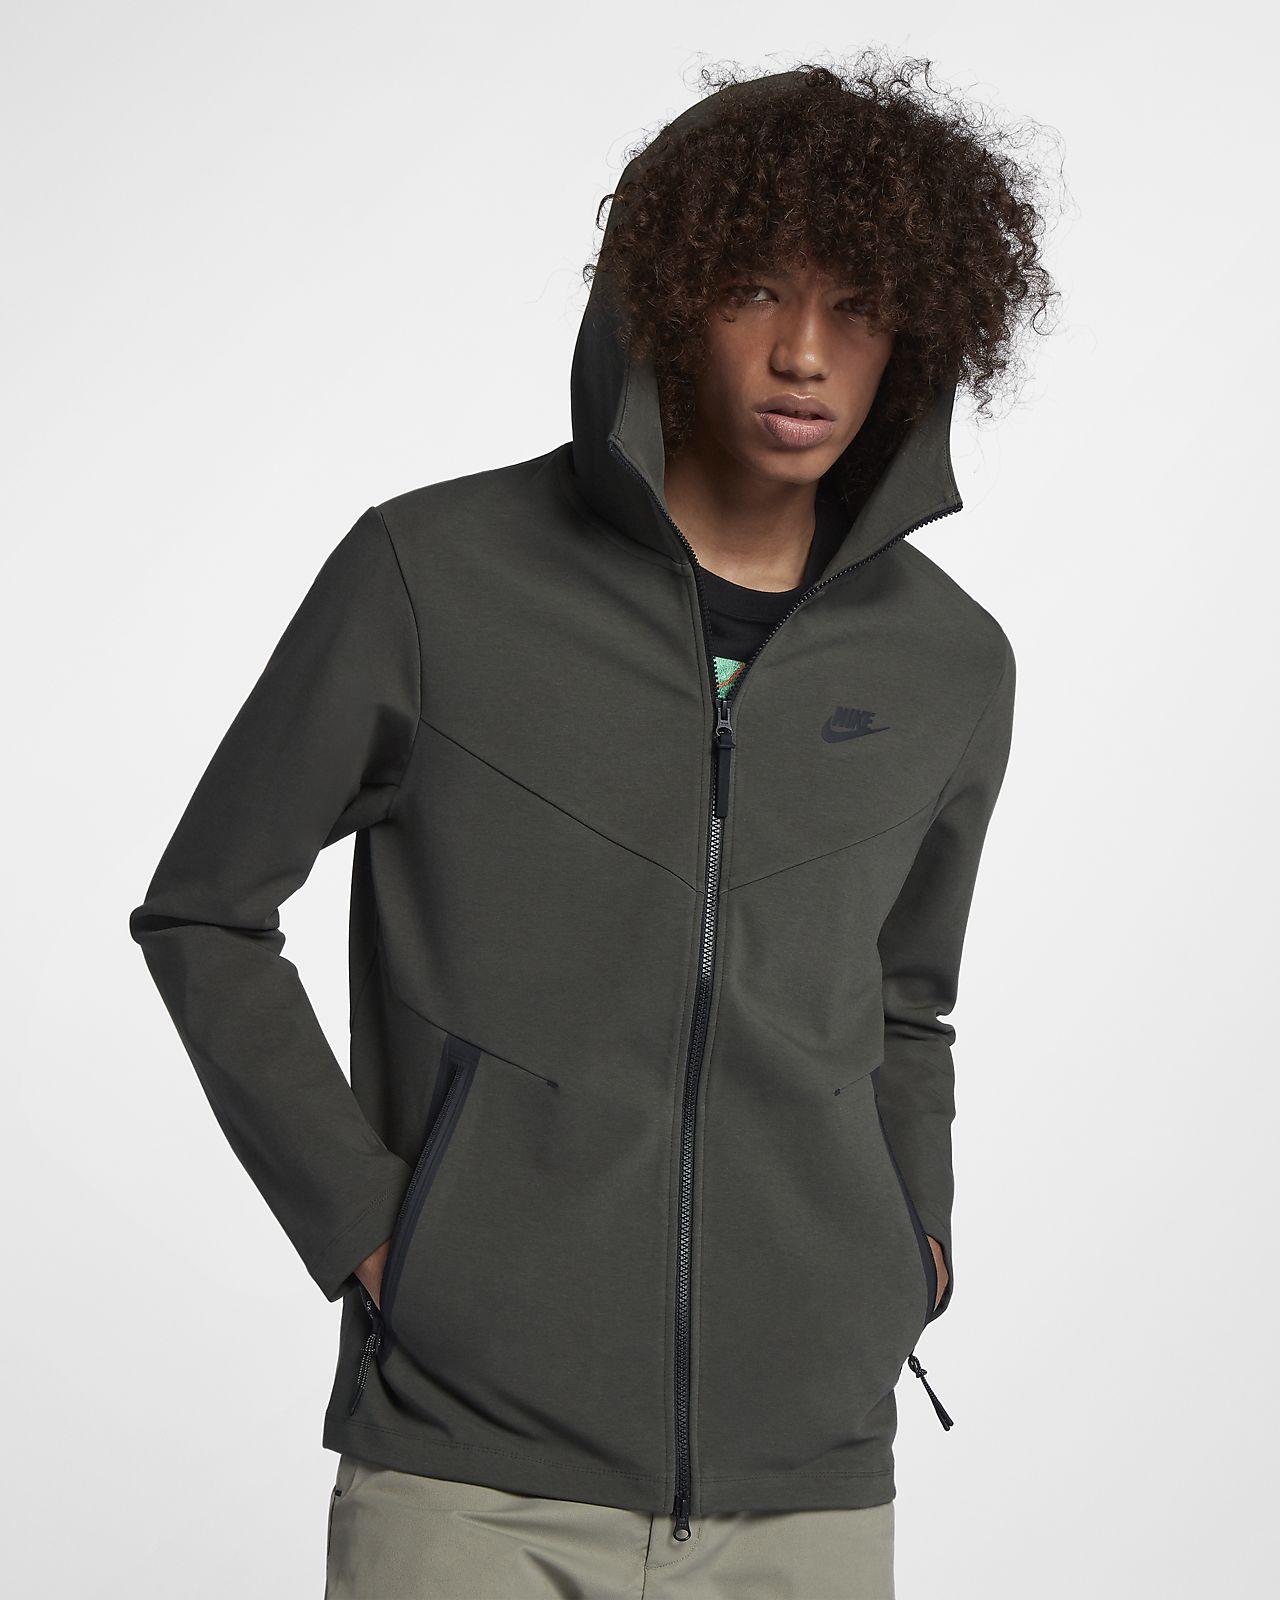 Nike Sportswear Tech Pack 男款全長式拉鍊連帽上衣